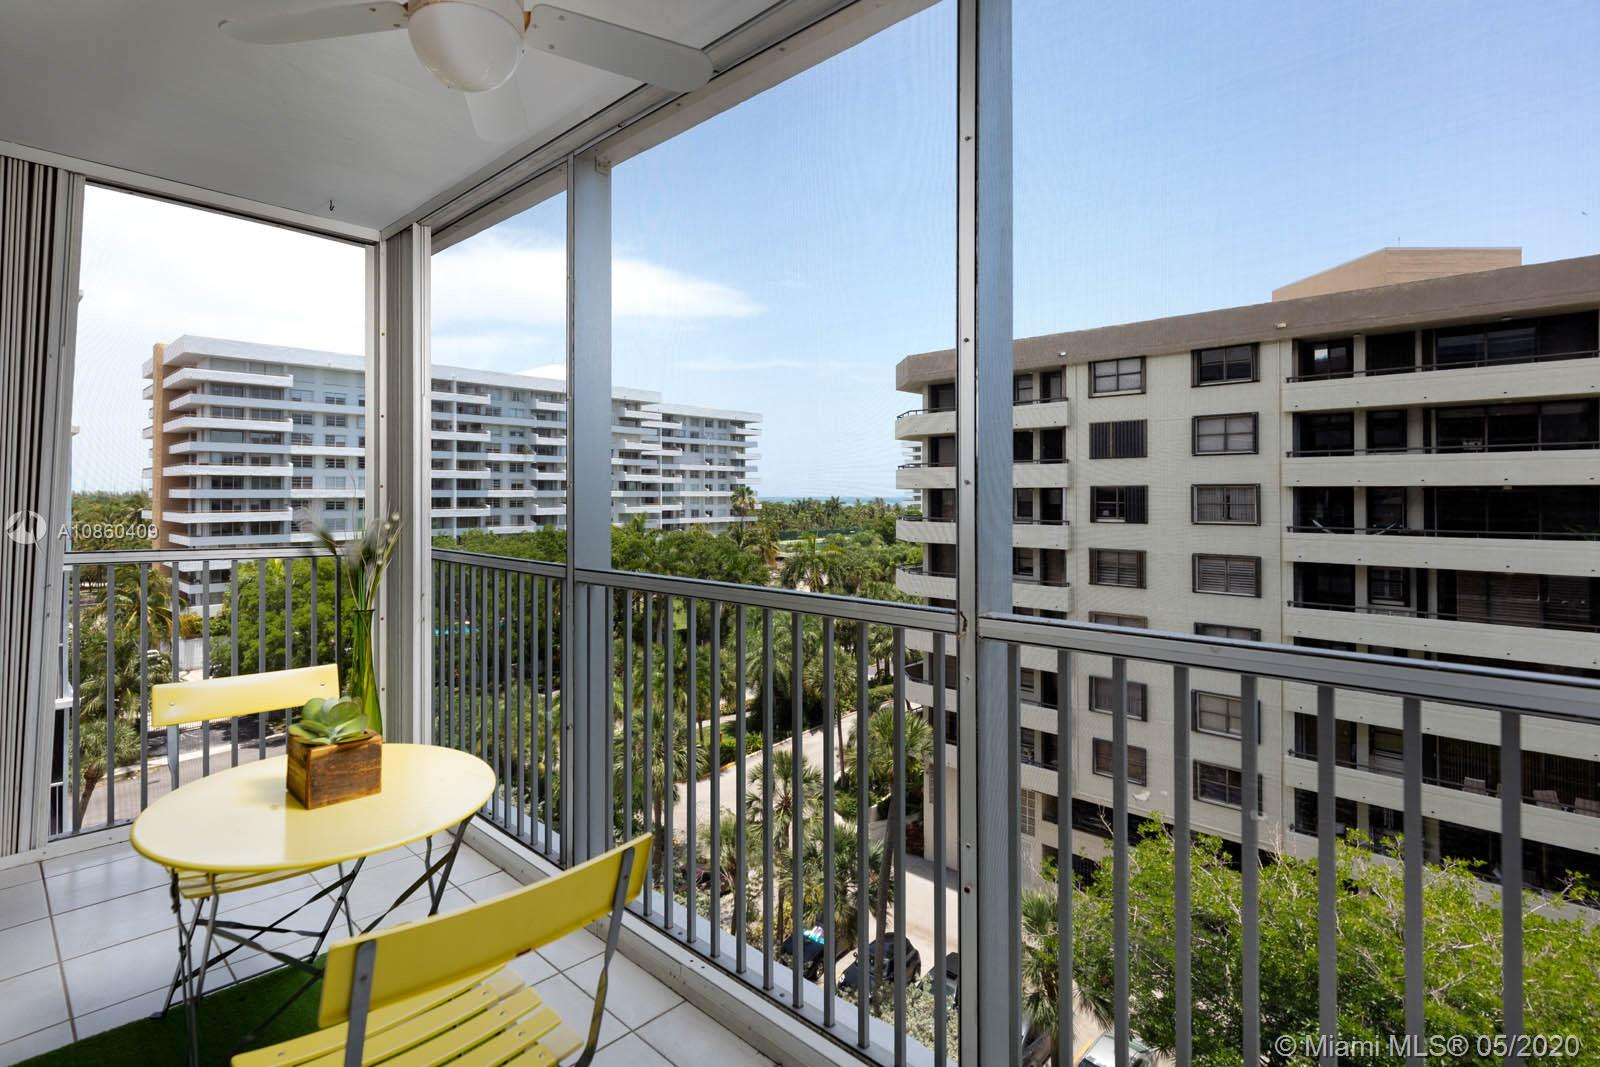 150 Ocean Lane Dr # 7G, Key Biscayne, Florida 33149, 2 Bedrooms Bedrooms, ,2 BathroomsBathrooms,Residential,For Sale,150 Ocean Lane Dr # 7G,A10860409